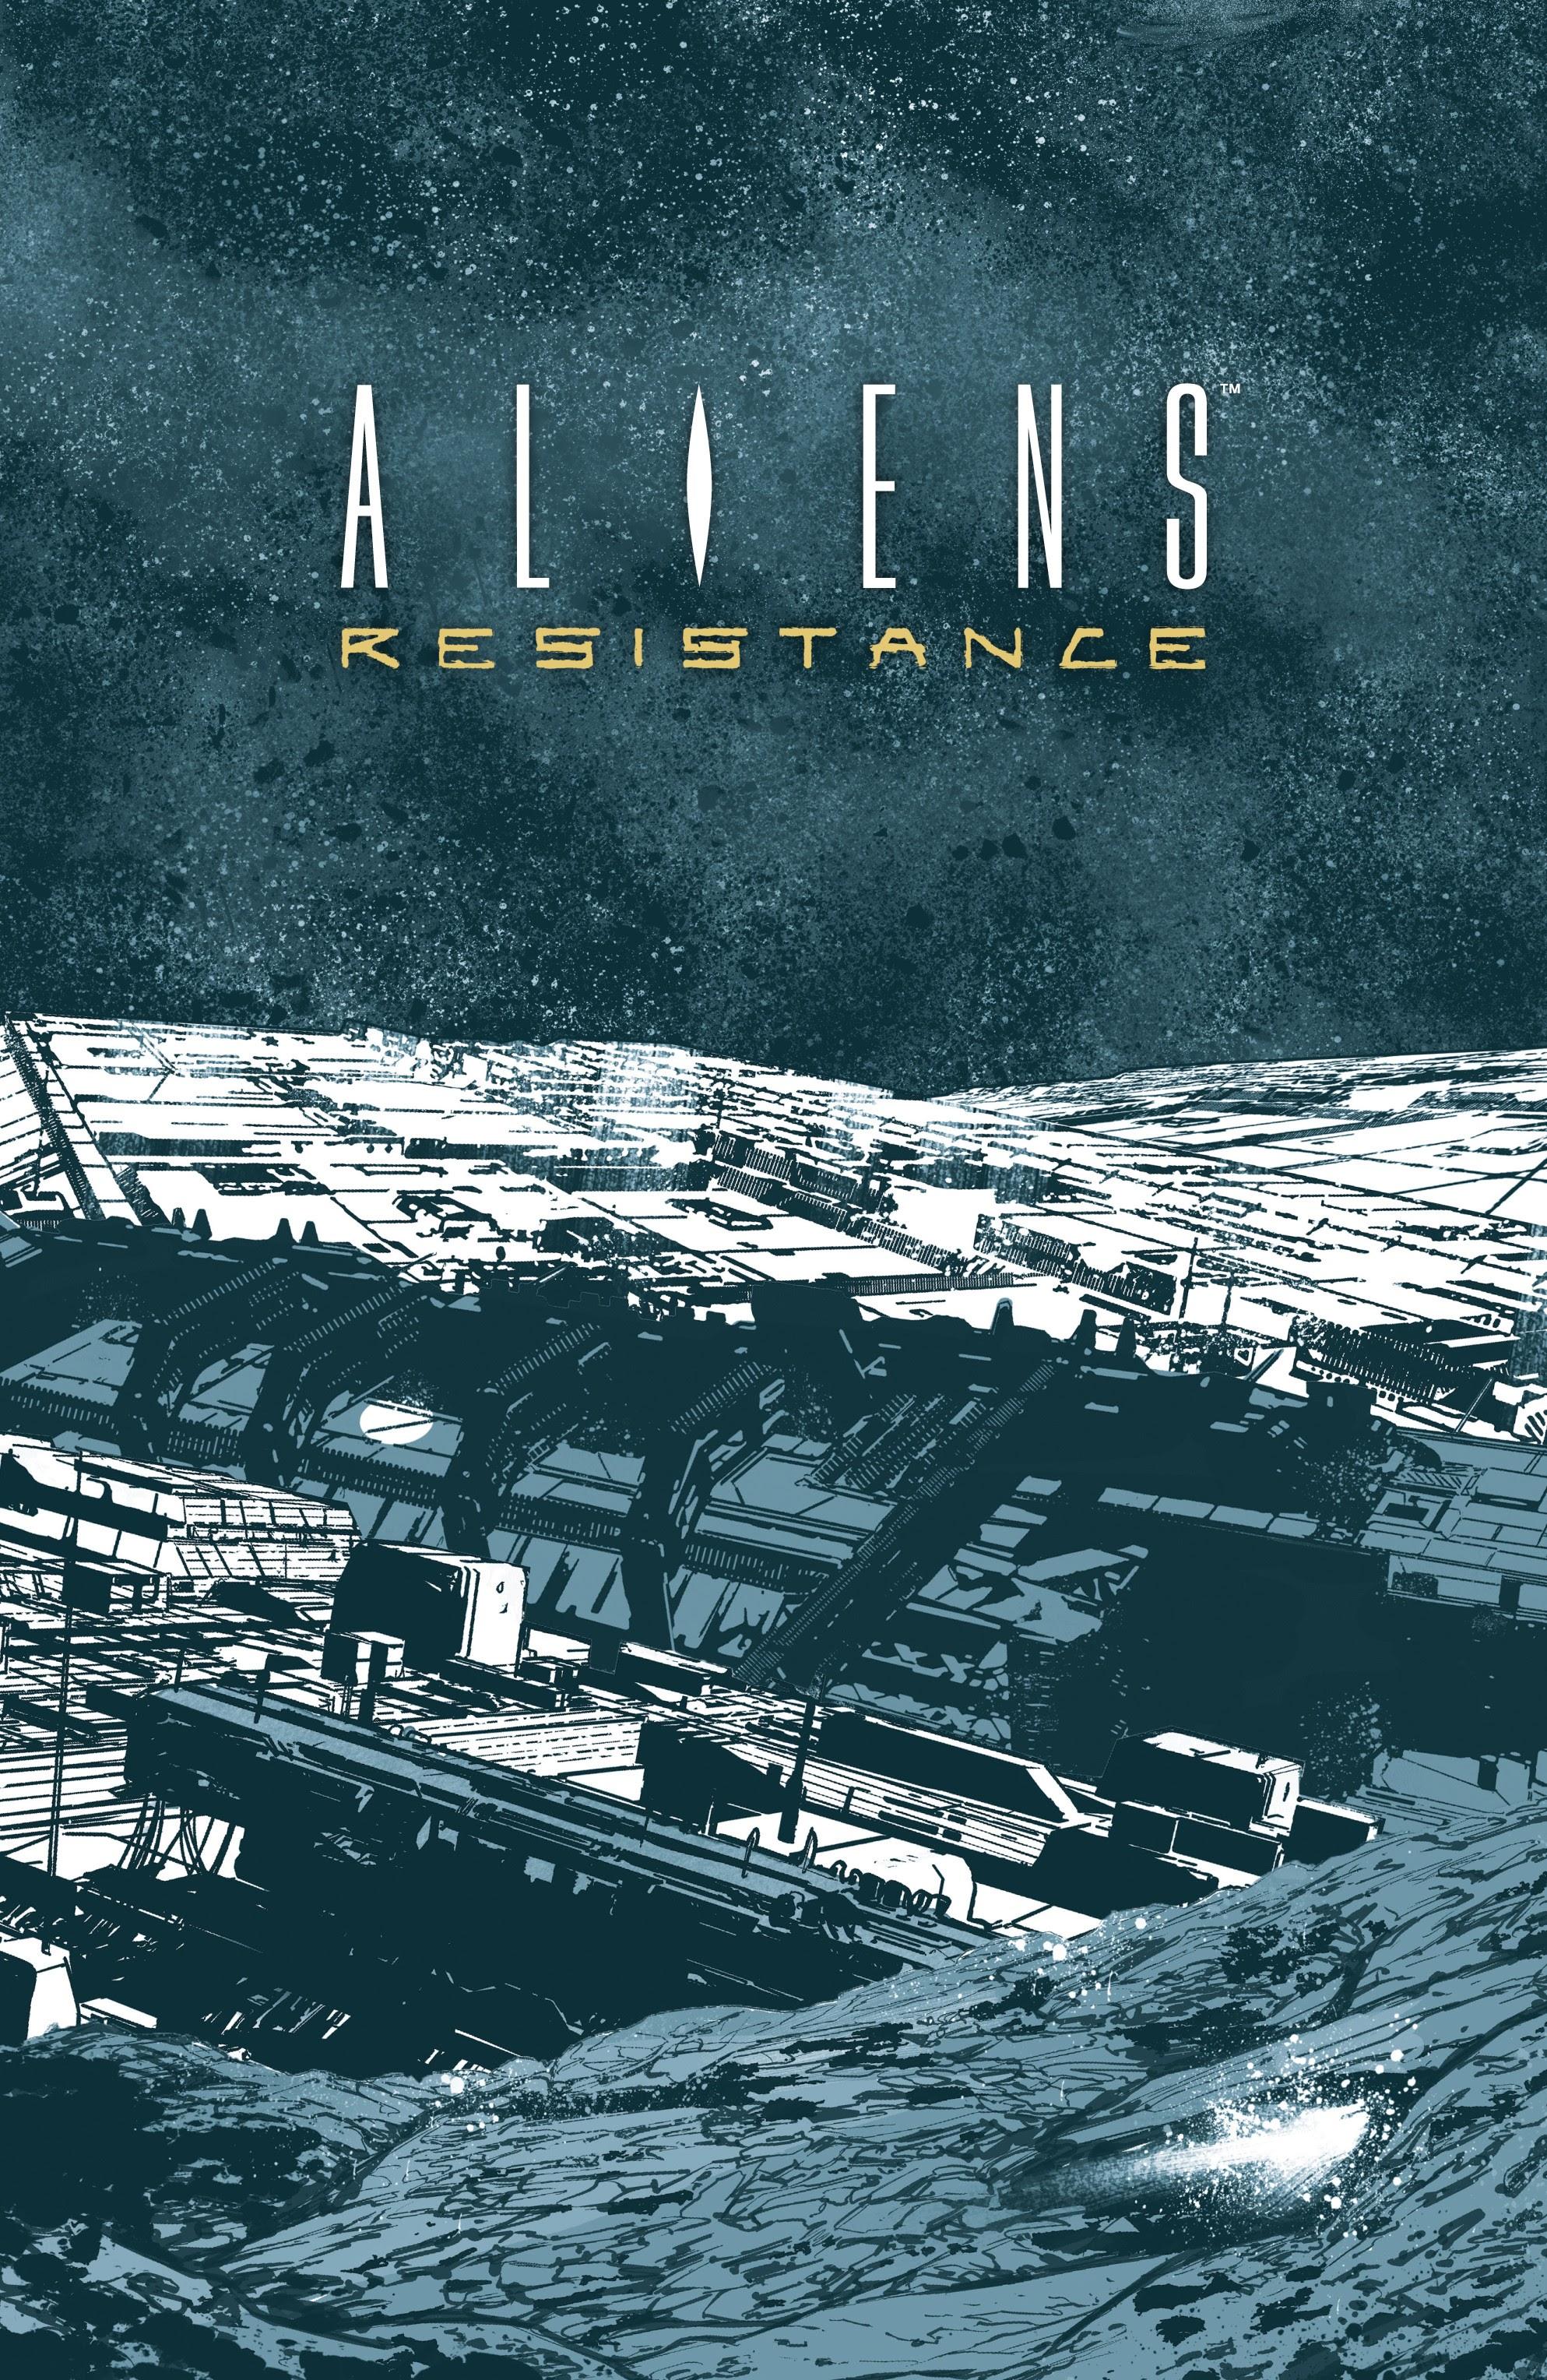 Read online Aliens: Resistance comic -  Issue # _TPB - 3